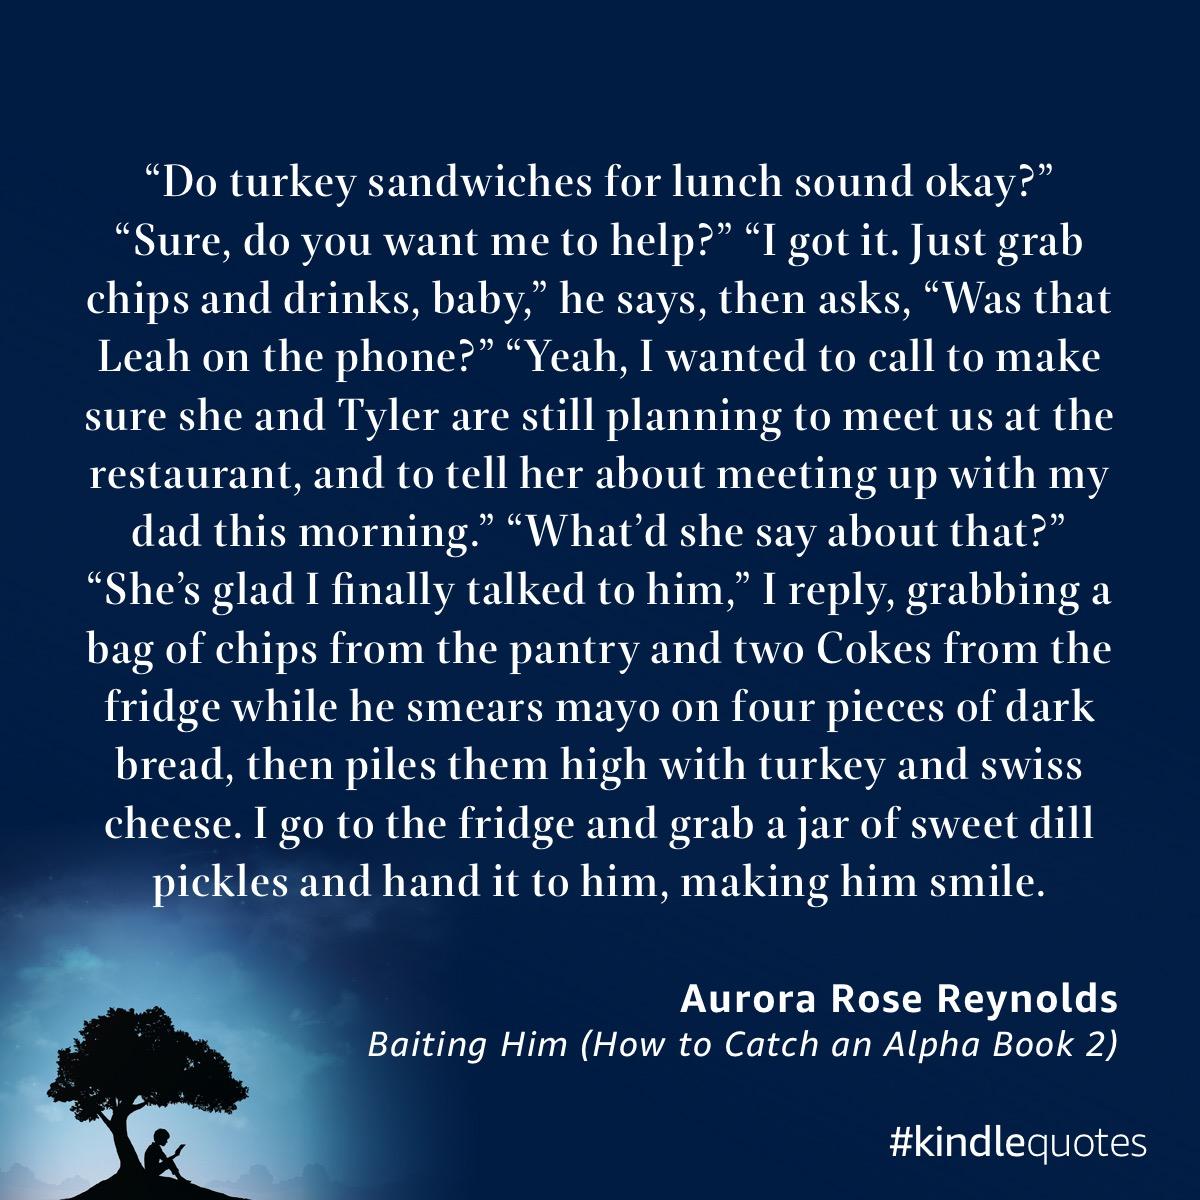 Book quote Aurora Rose Reynolds